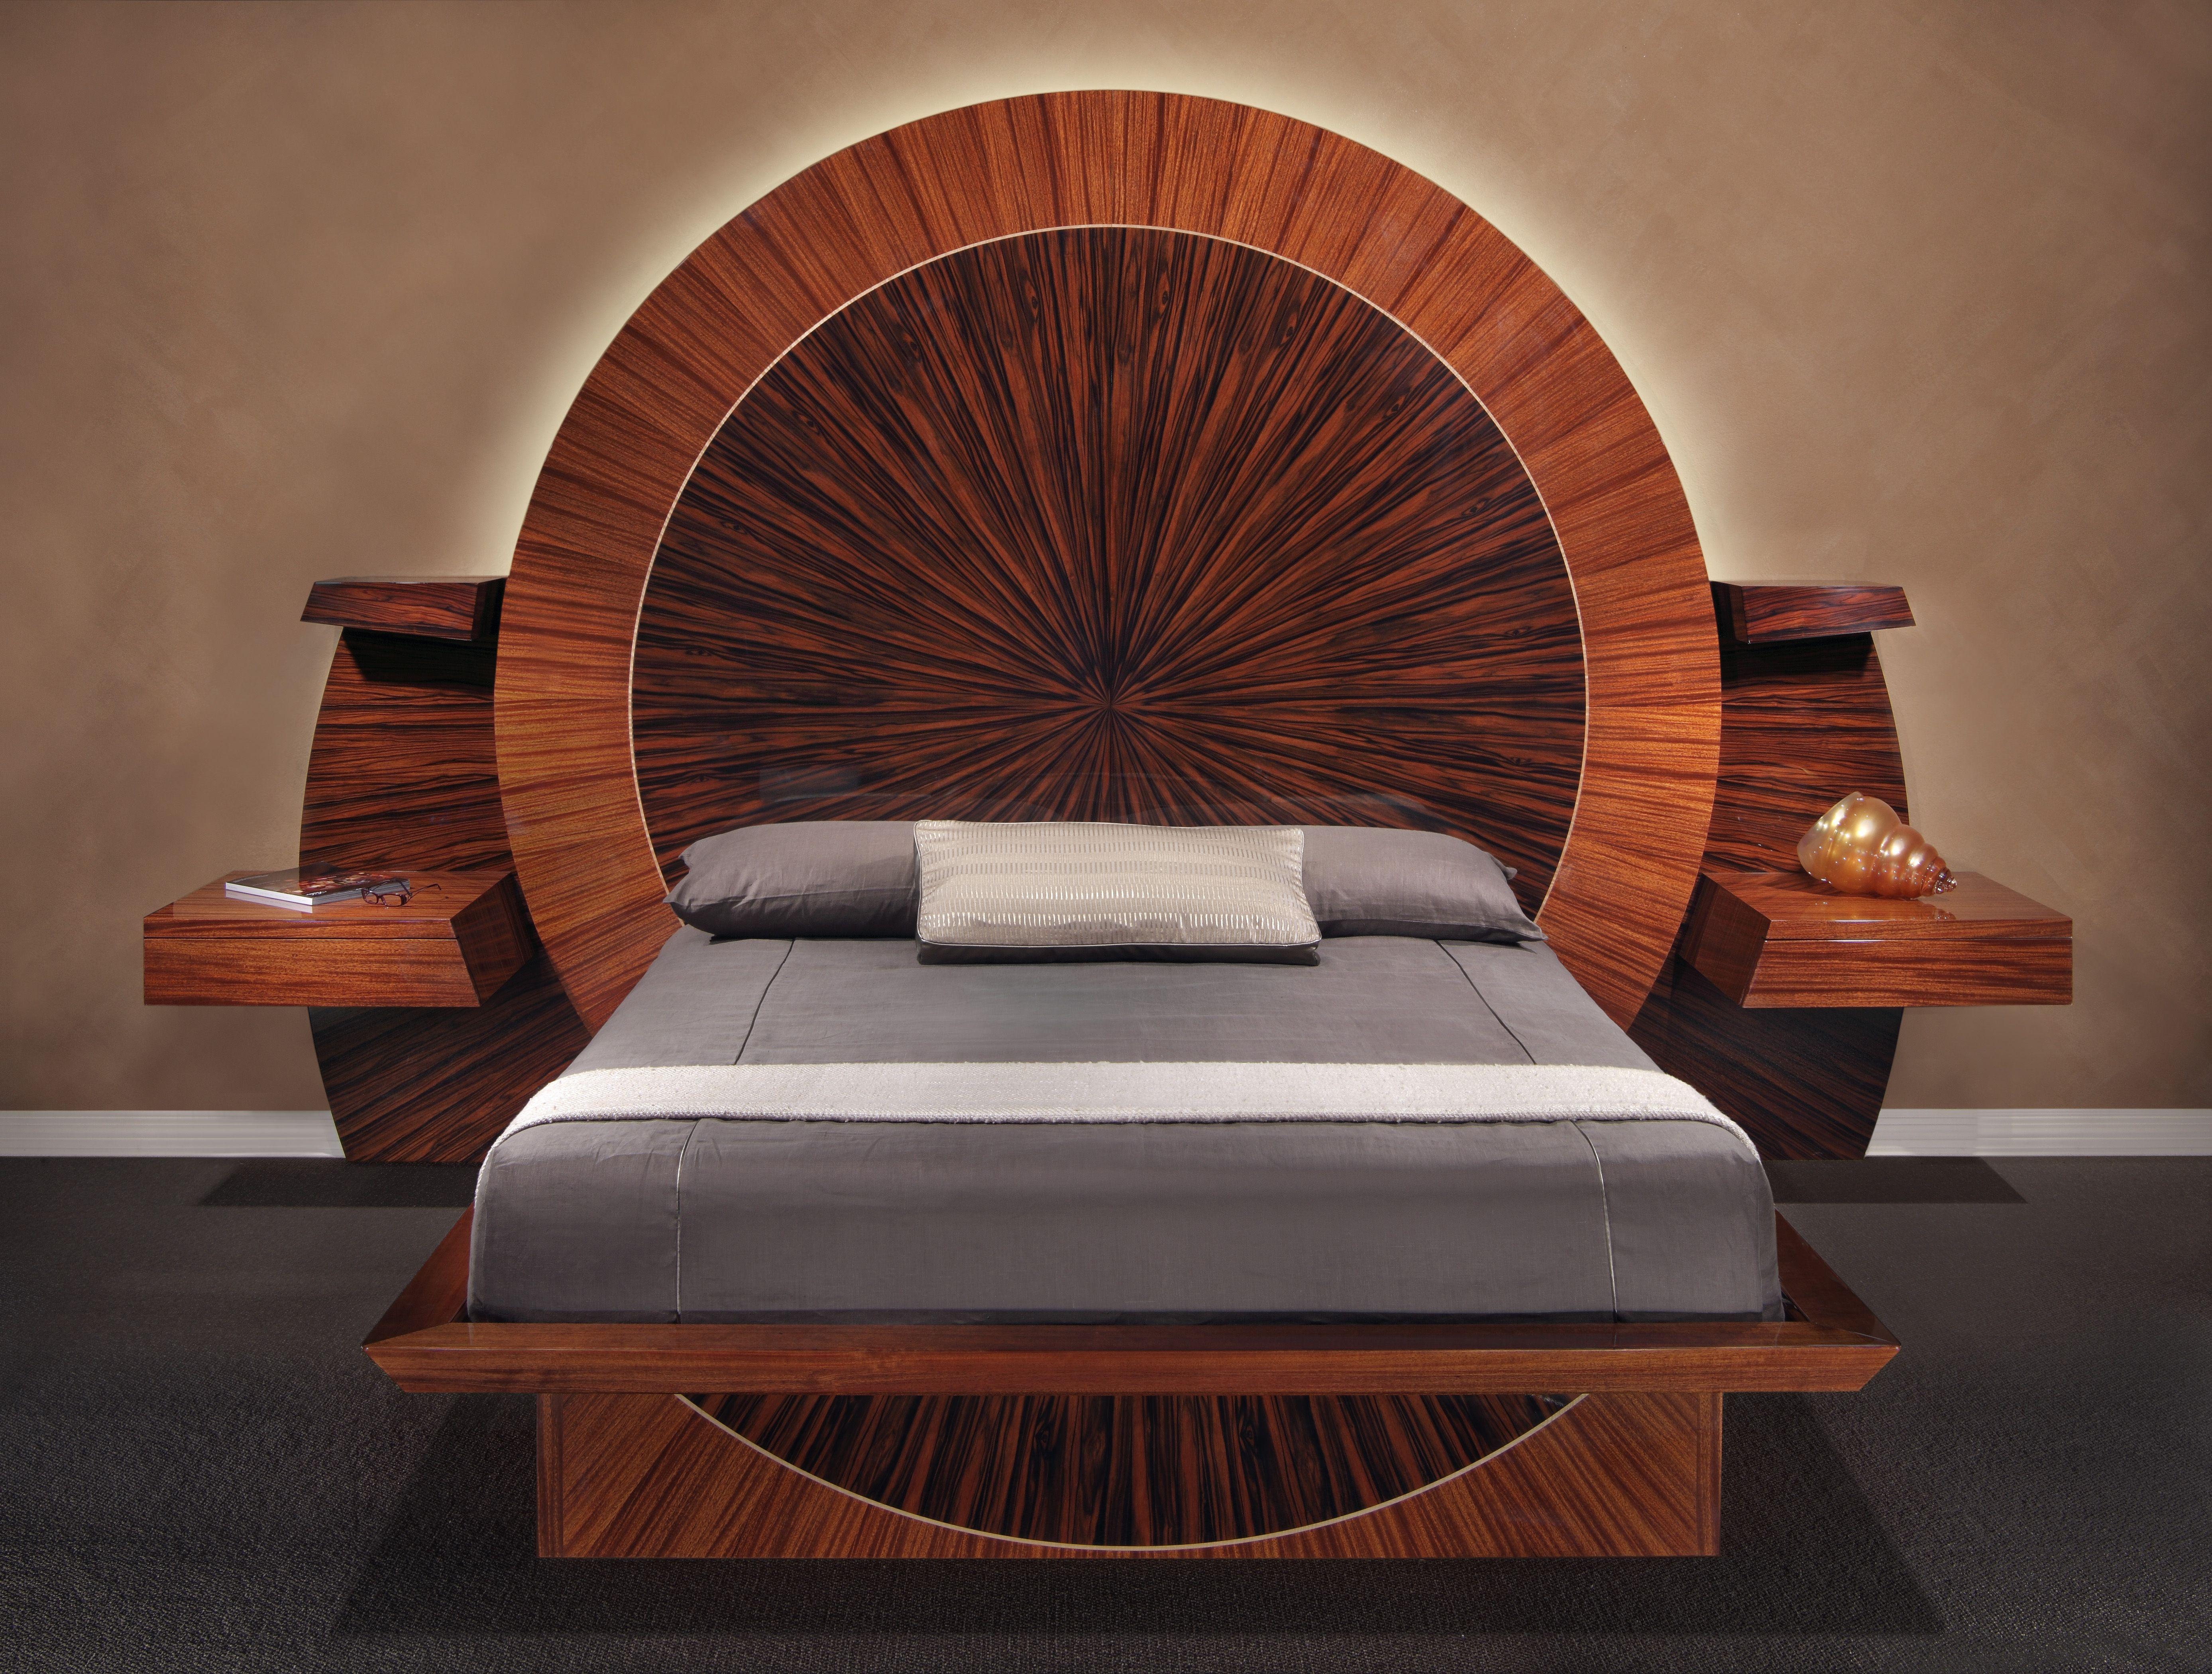 Parnian bed | Architecture/Interior Design | Pinterest